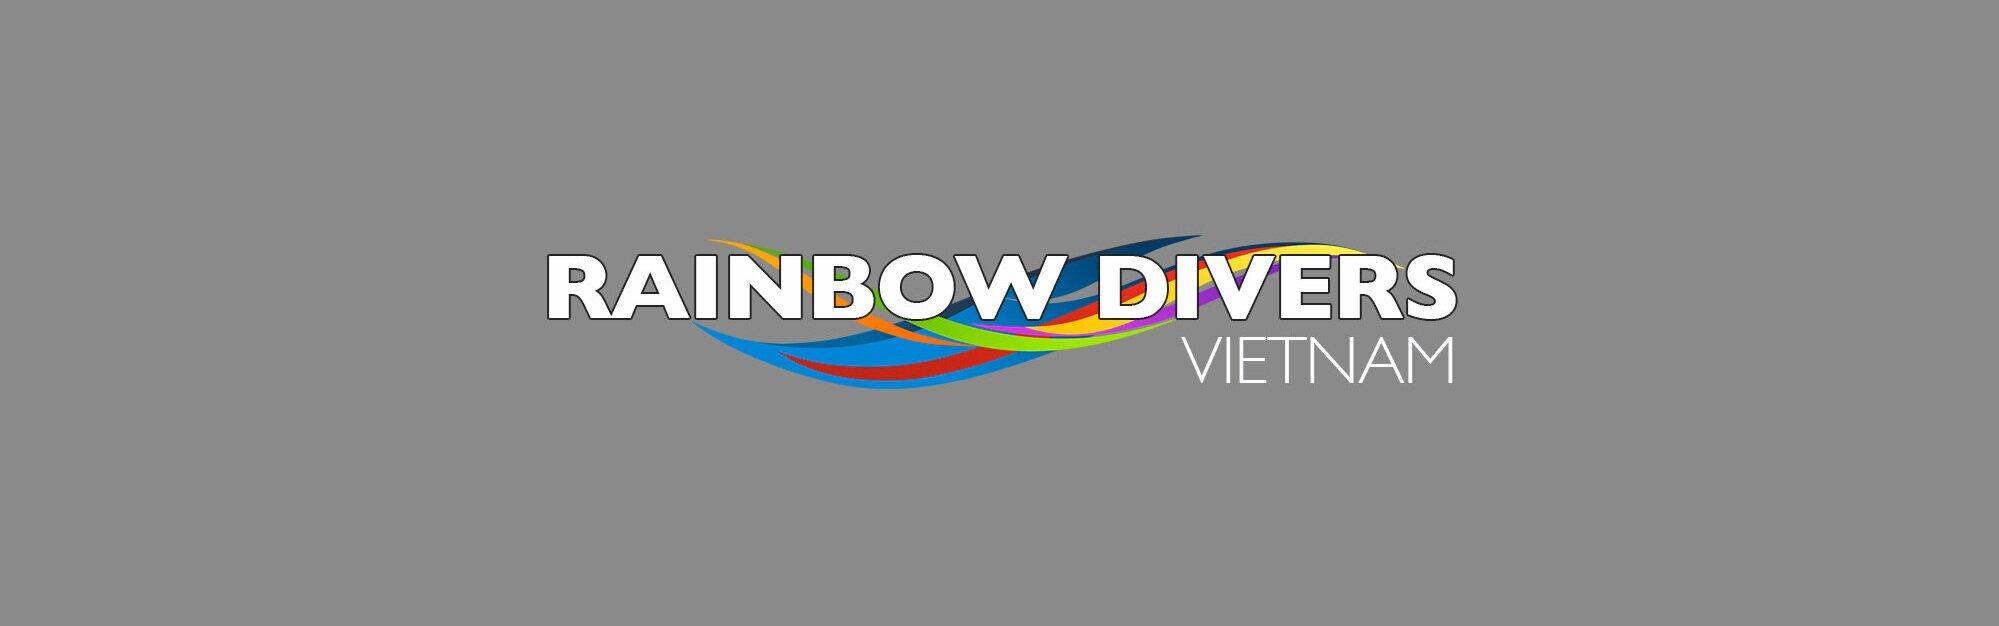 Rainbow_Divers.jpg